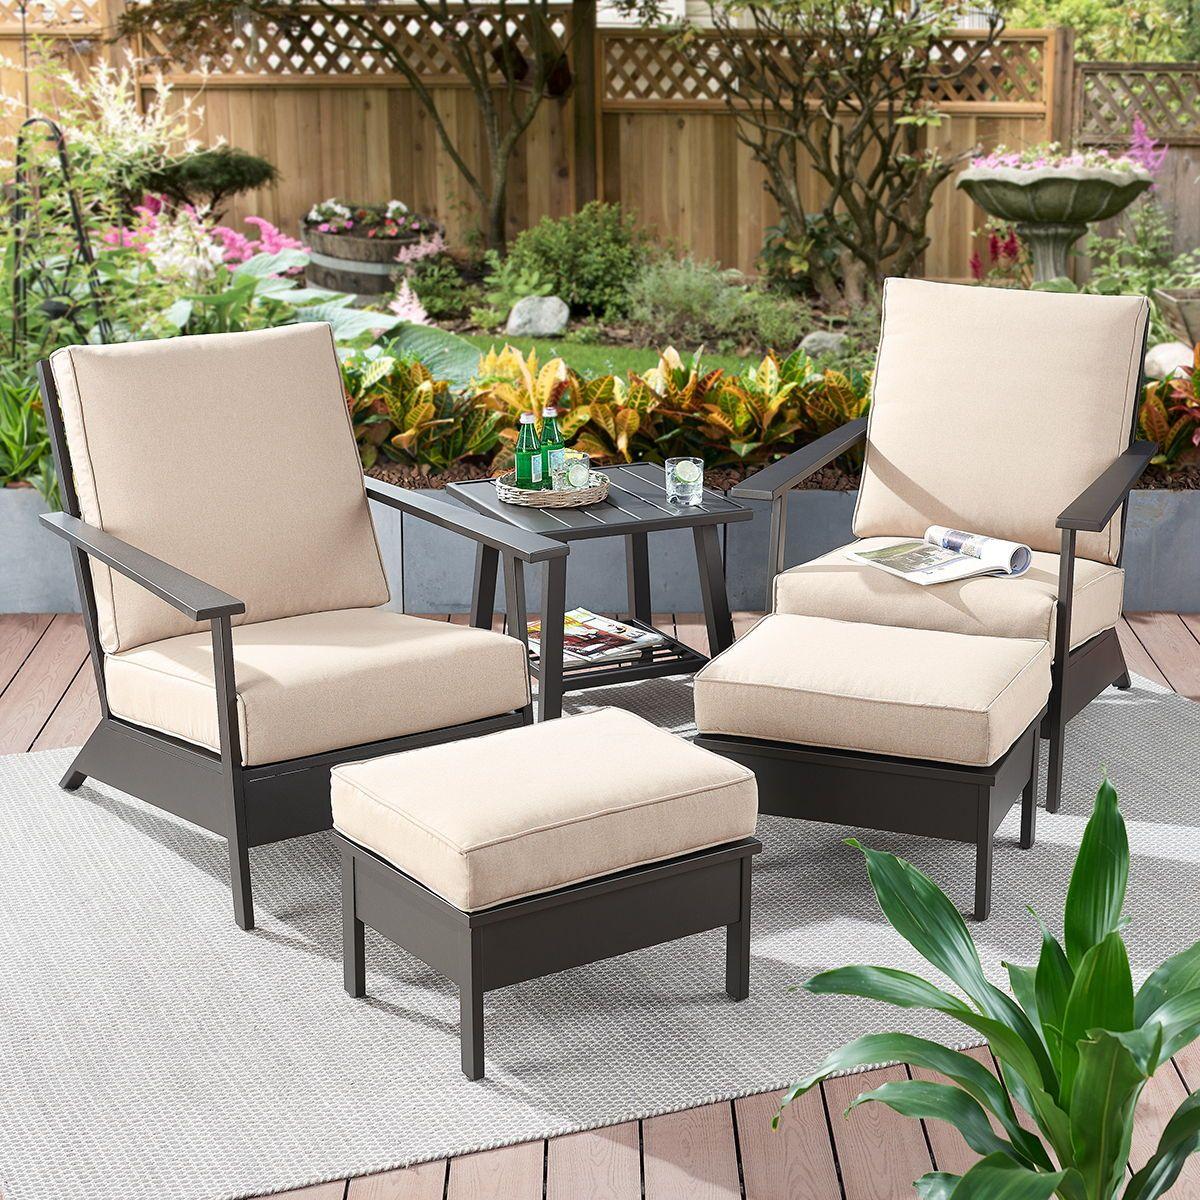 Better Homes Gardens Emeryville 5 Piece Chat Set With Beige Cushions Walmart Com Beige Cushions Better Homes Gardens Better Homes